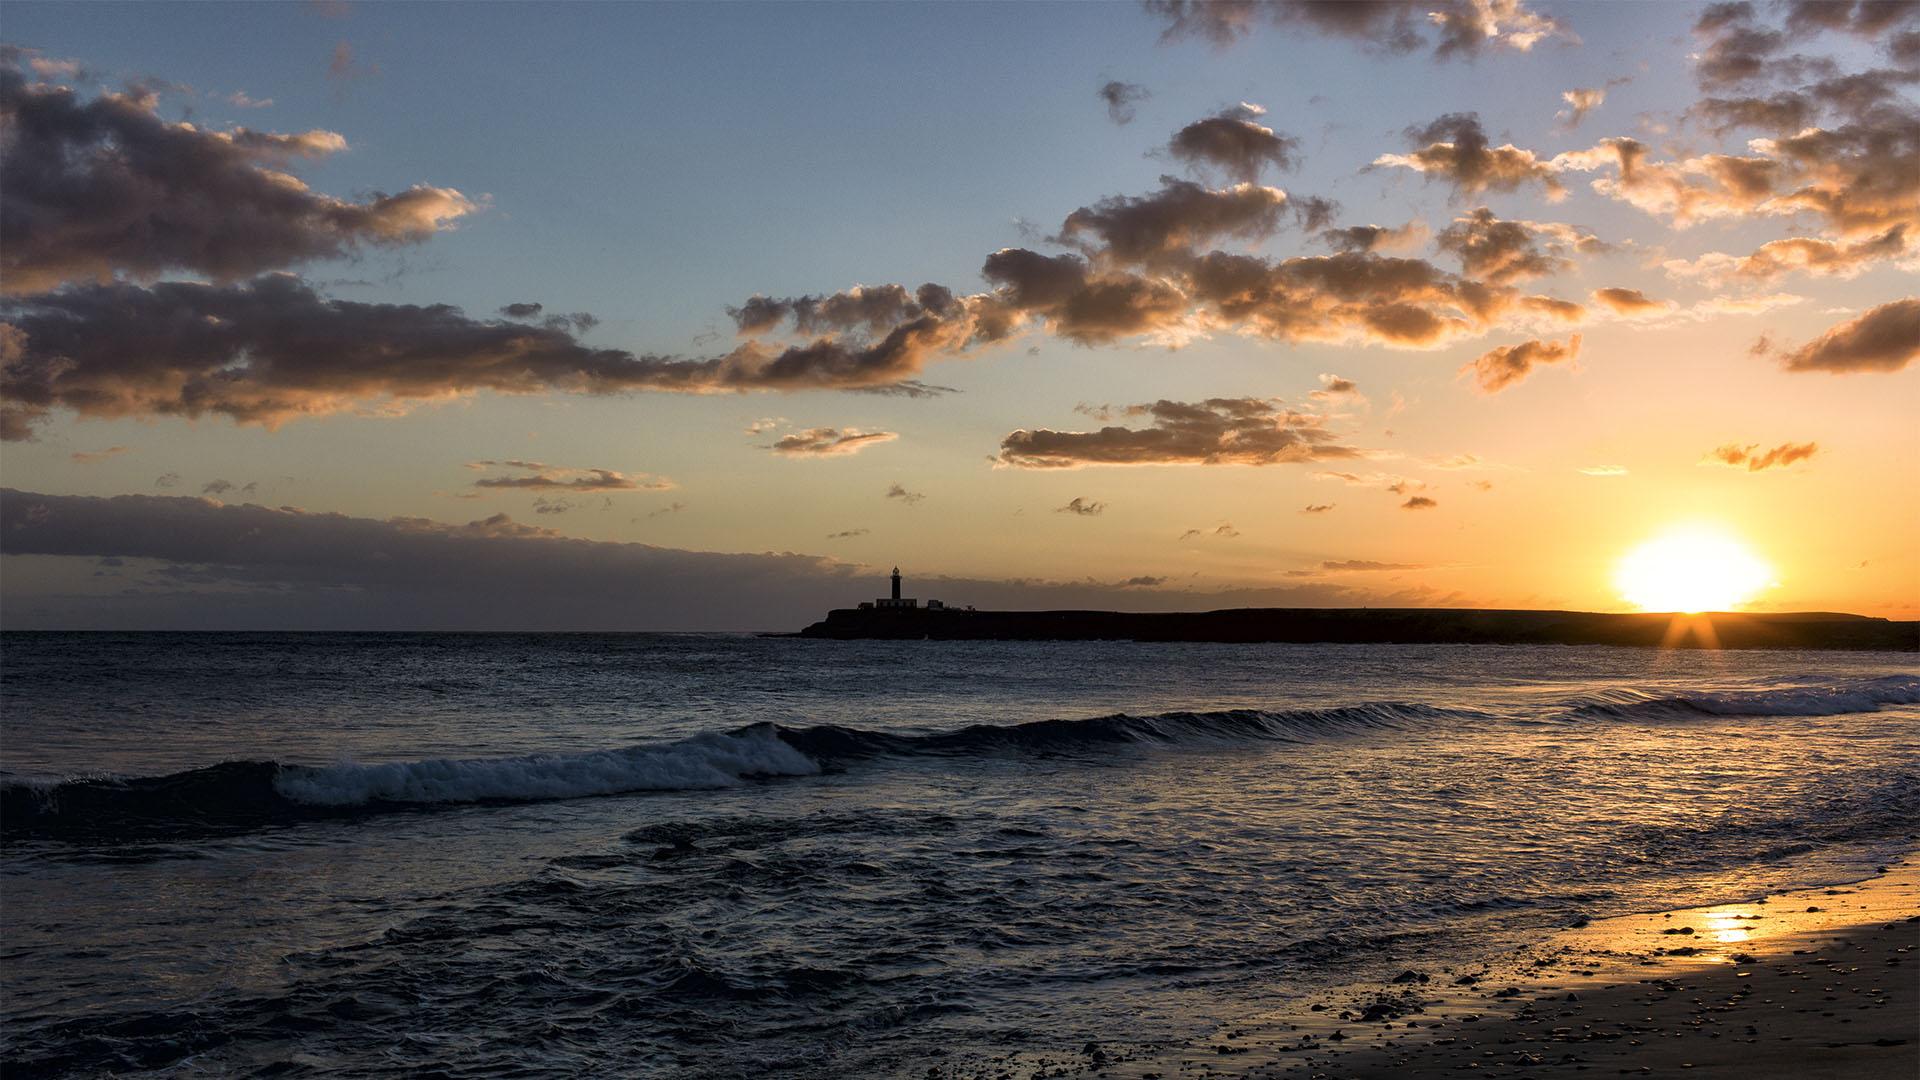 Atemberaubende Sonnenuntergänge besonders im Herbst –Faro de Punta de Jandía Fuerteventura.